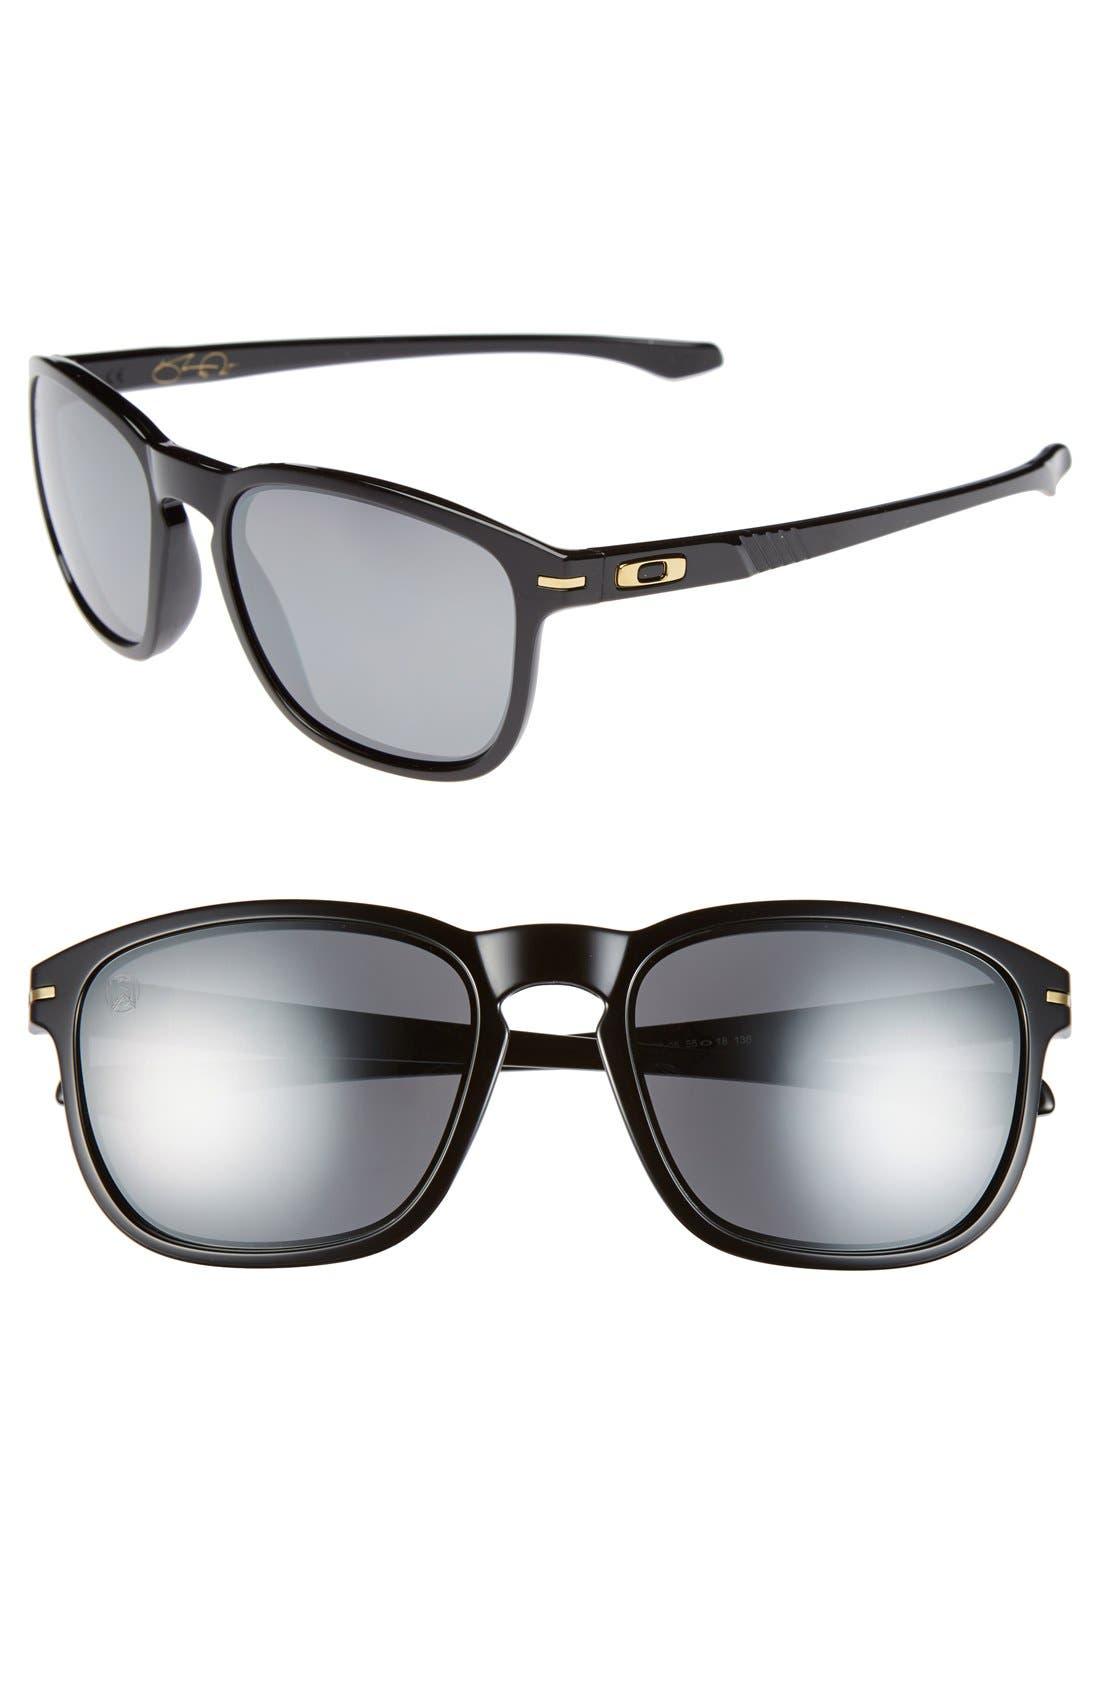 Alternate Image 1 Selected - Oakley 'Shaun White Signature Series - Enduro' 55mm Polarized Sunglasses